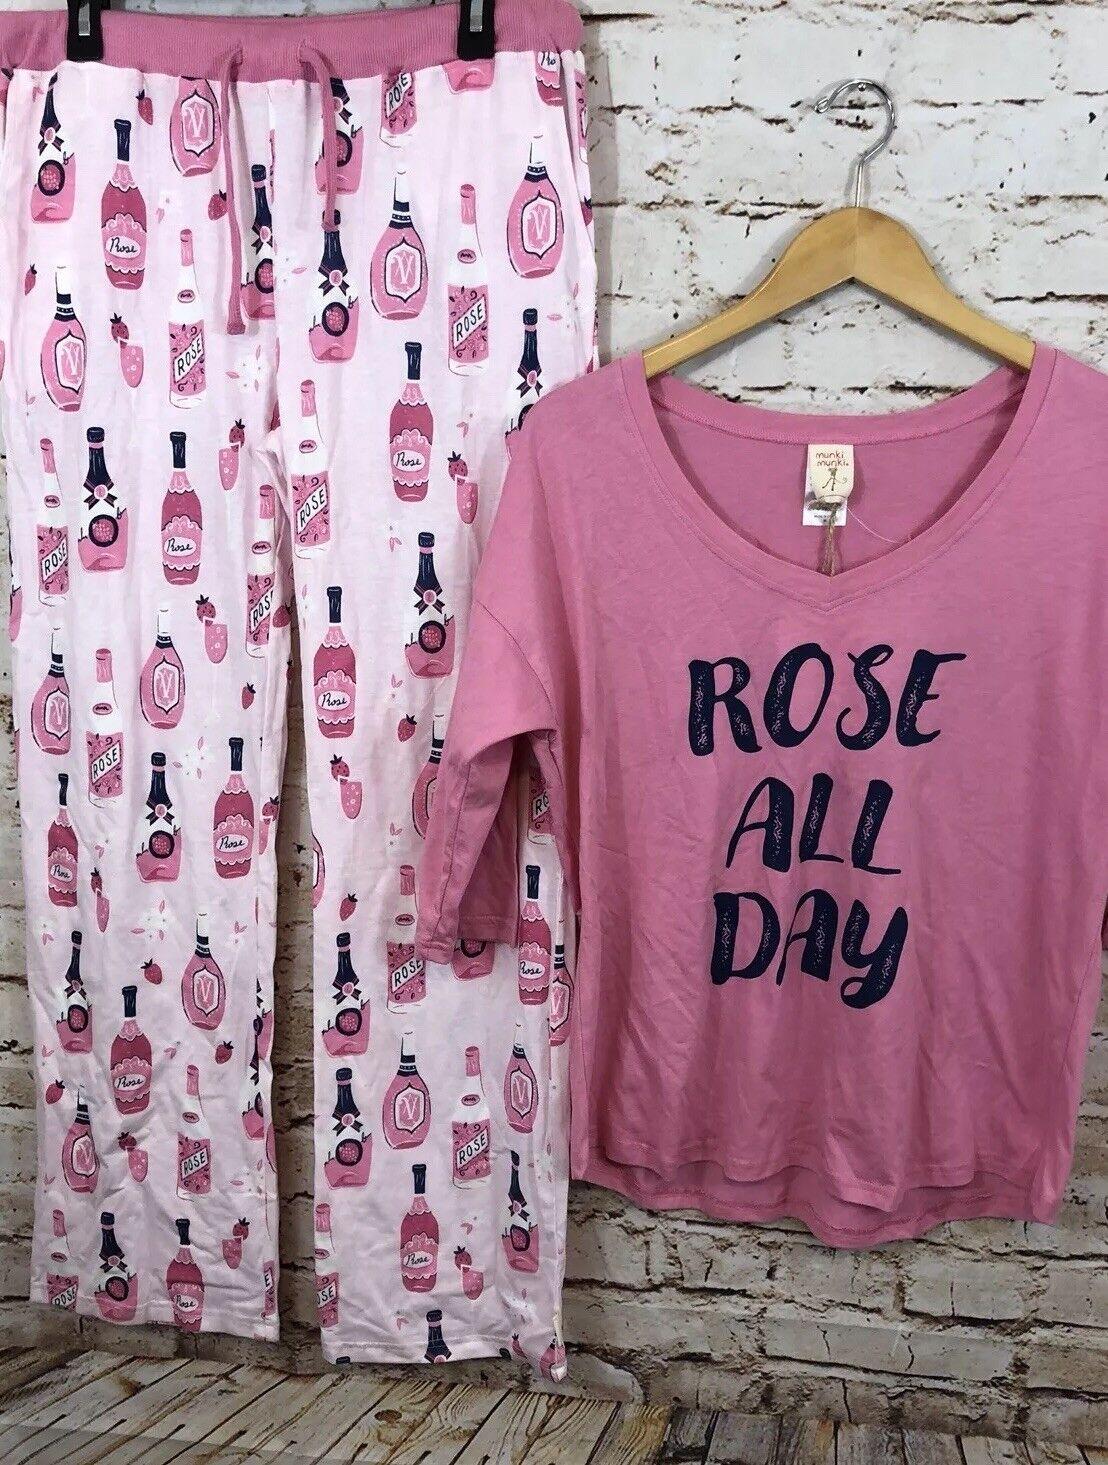 Munki Munki pajamas Womens XL pink All Day Wine Pink Pants shirt Set new M8